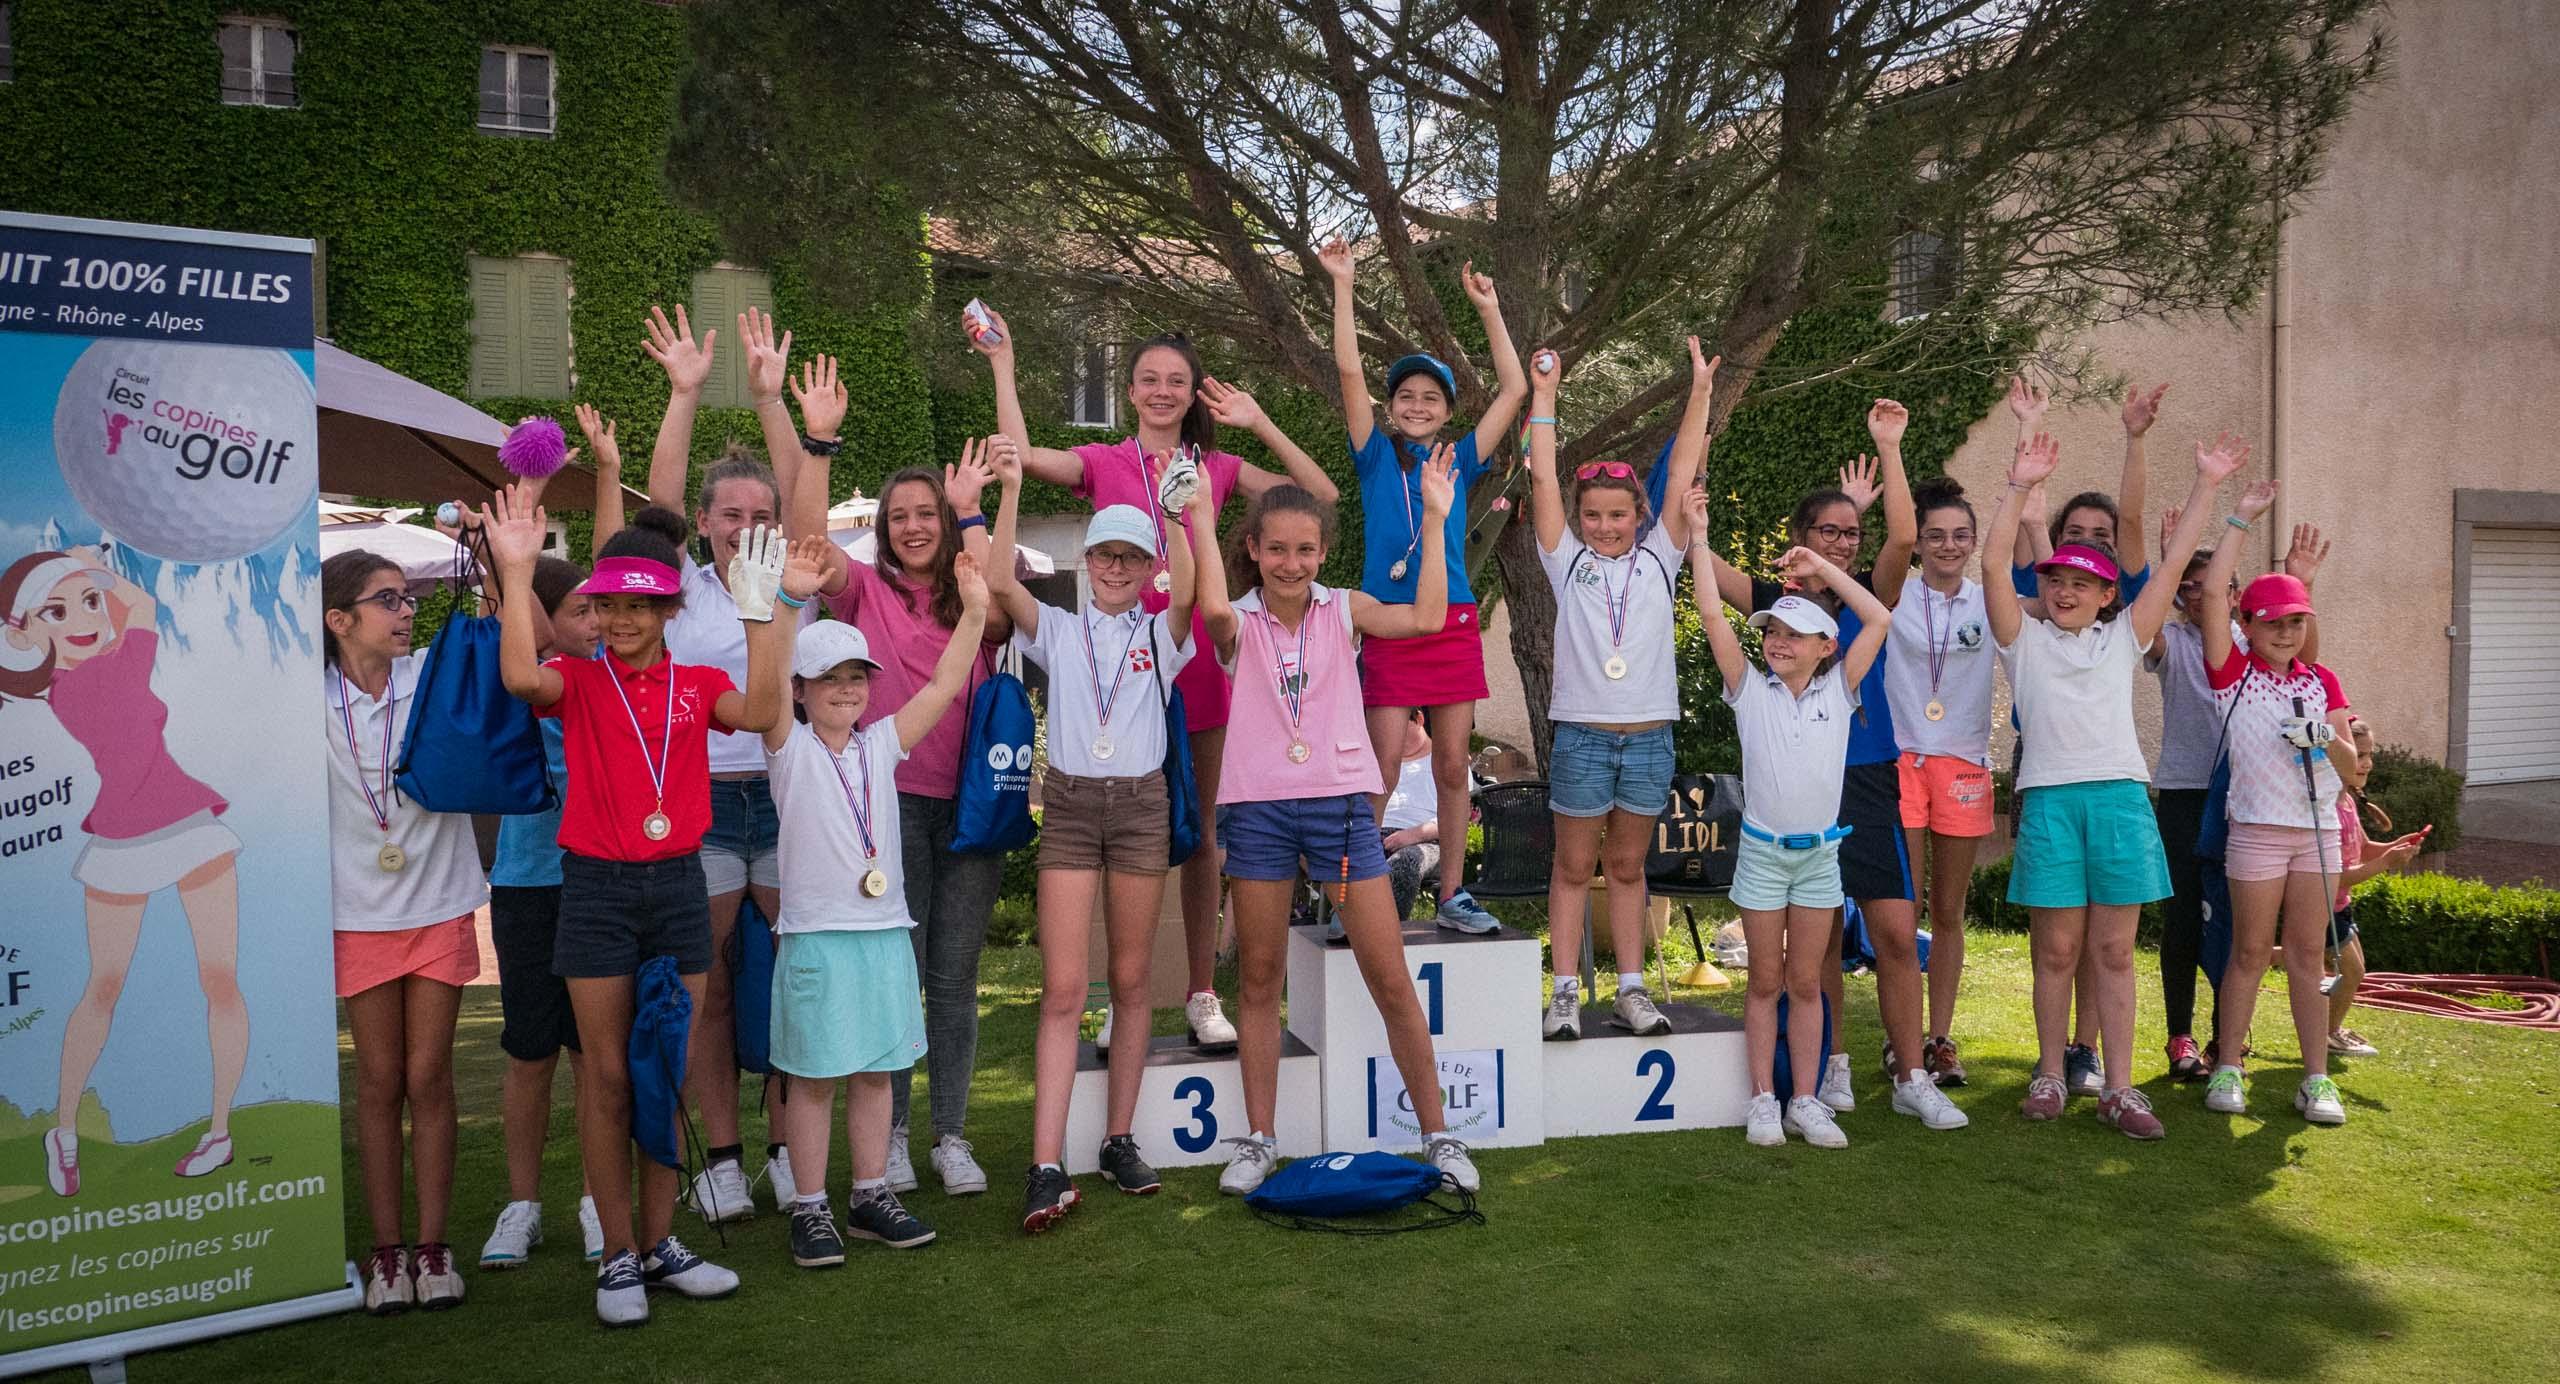 Copines Au Golf 2018 Superflu 112